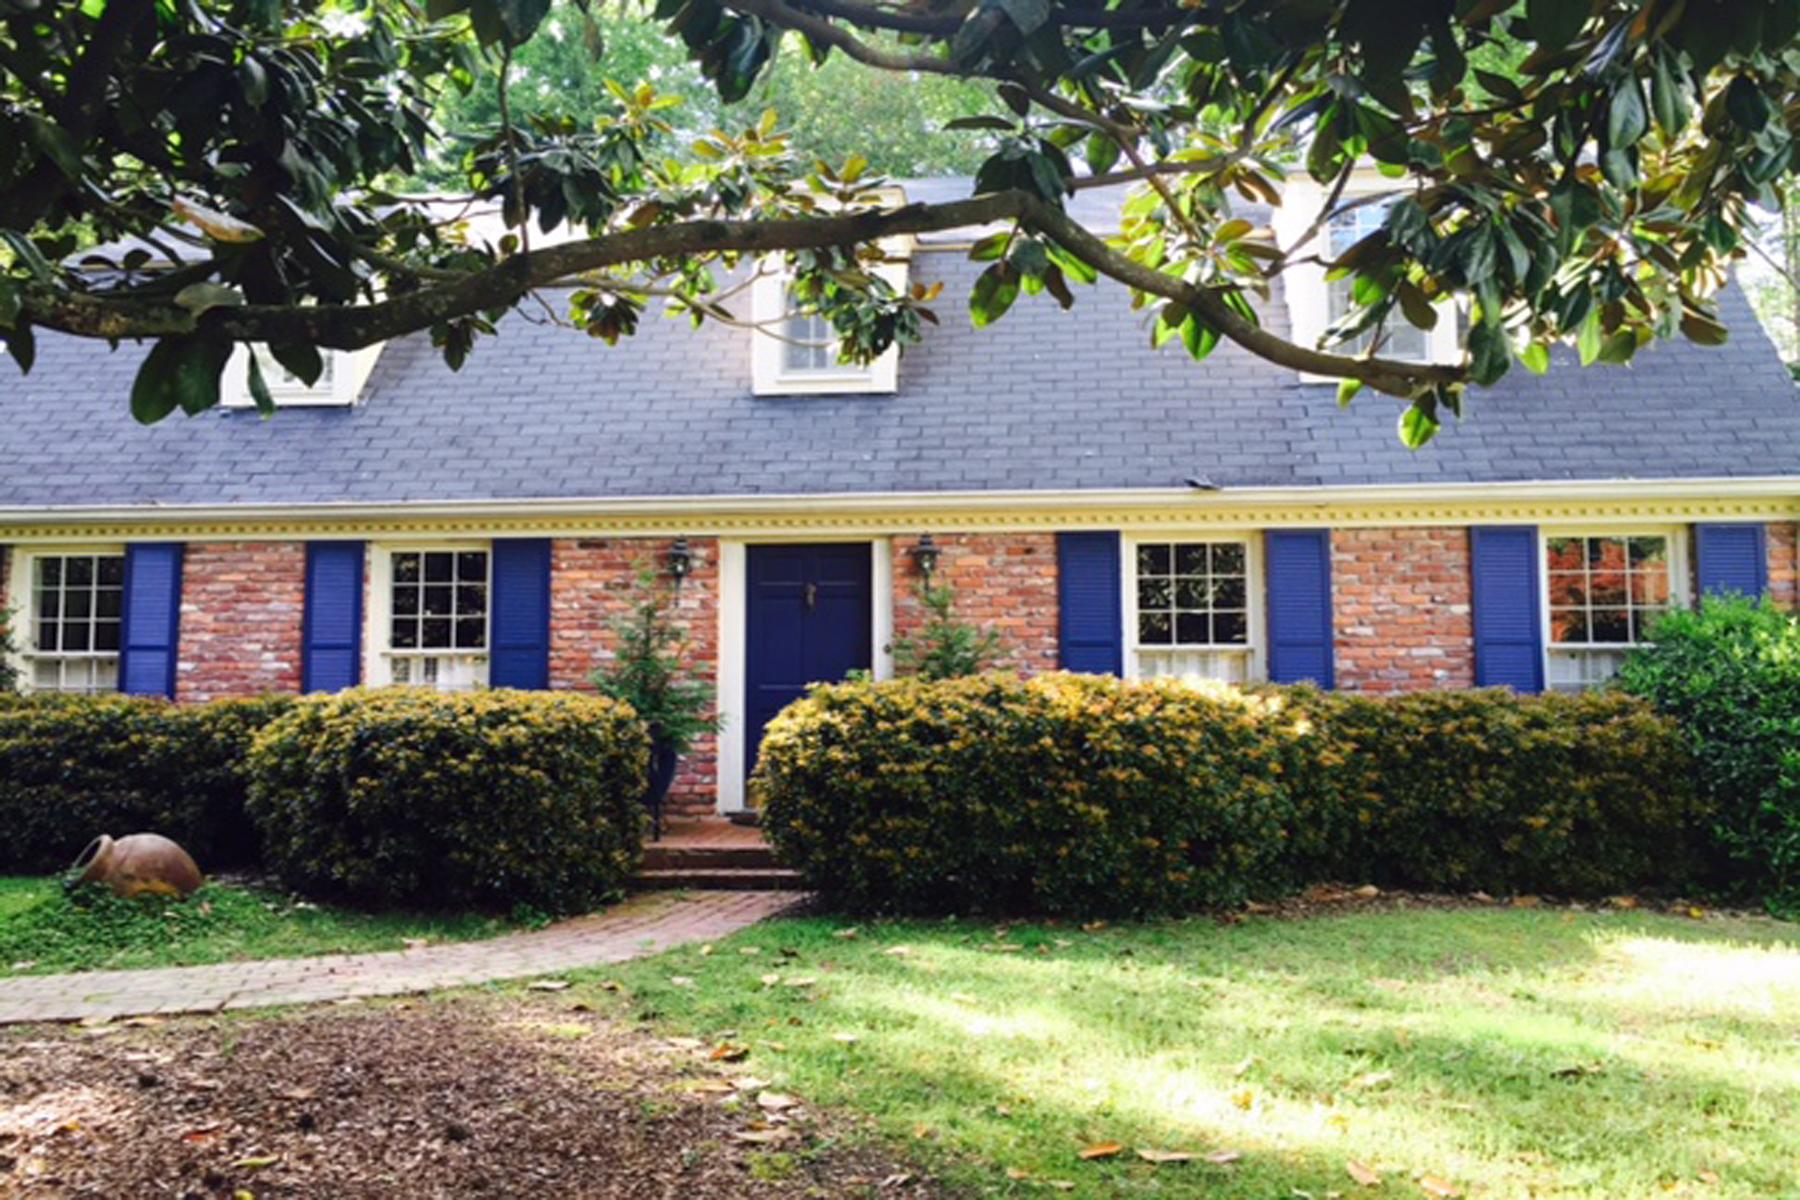 獨棟家庭住宅 為 出售 在 Great Opportunity 989 Winding Creek Trail Sandy Springs, 喬治亞州, 30328 美國